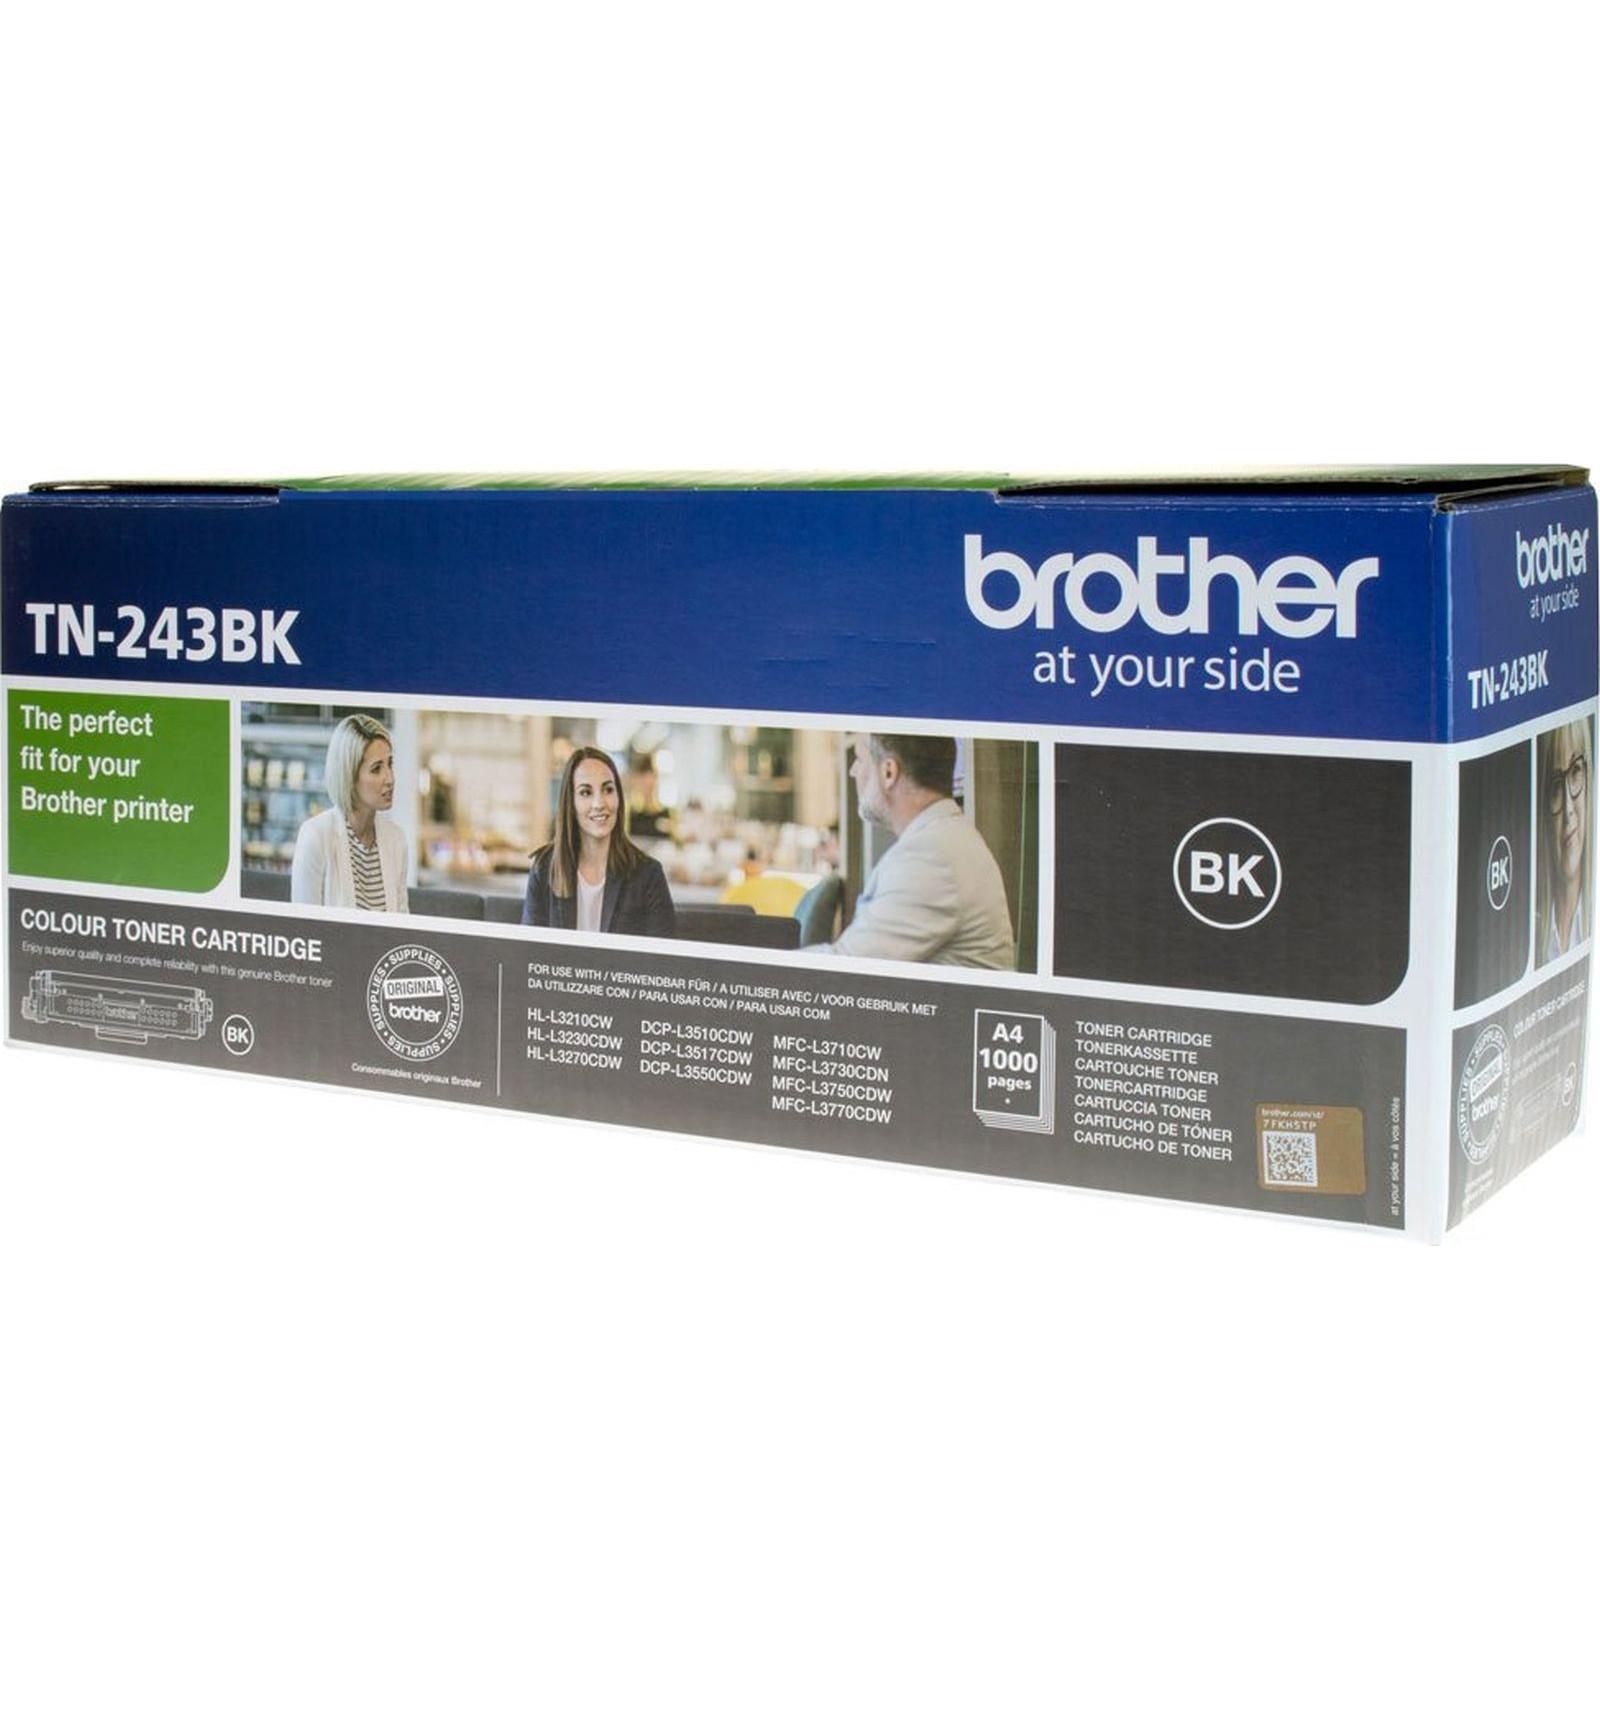 Brother TN-243BK Black